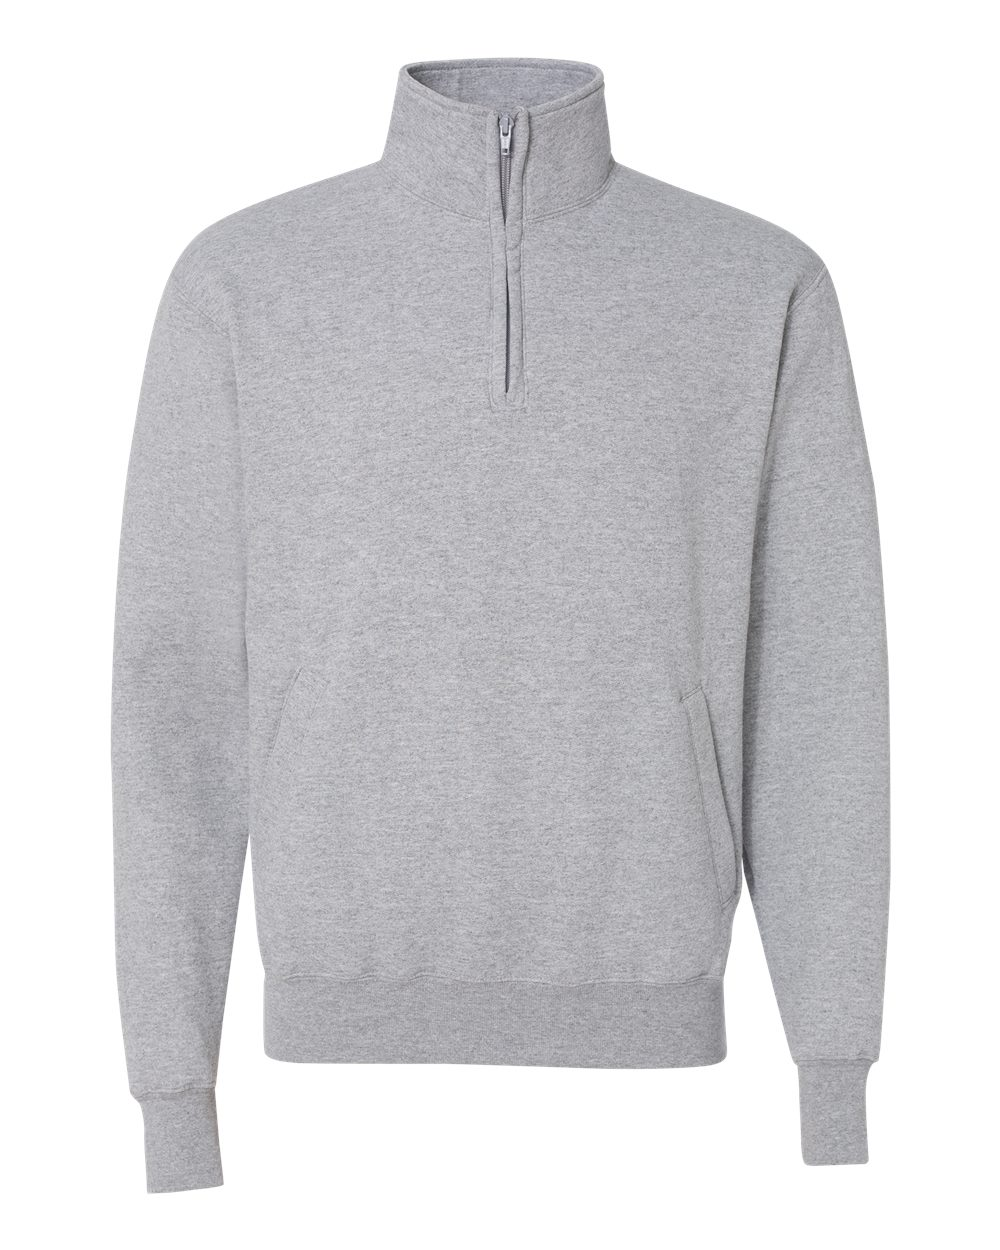 Champion-Mens-Double-Dry-Eco-Quarter-Zip-Pullover-Sweatshirt-S400-up-to-3XL miniature 9